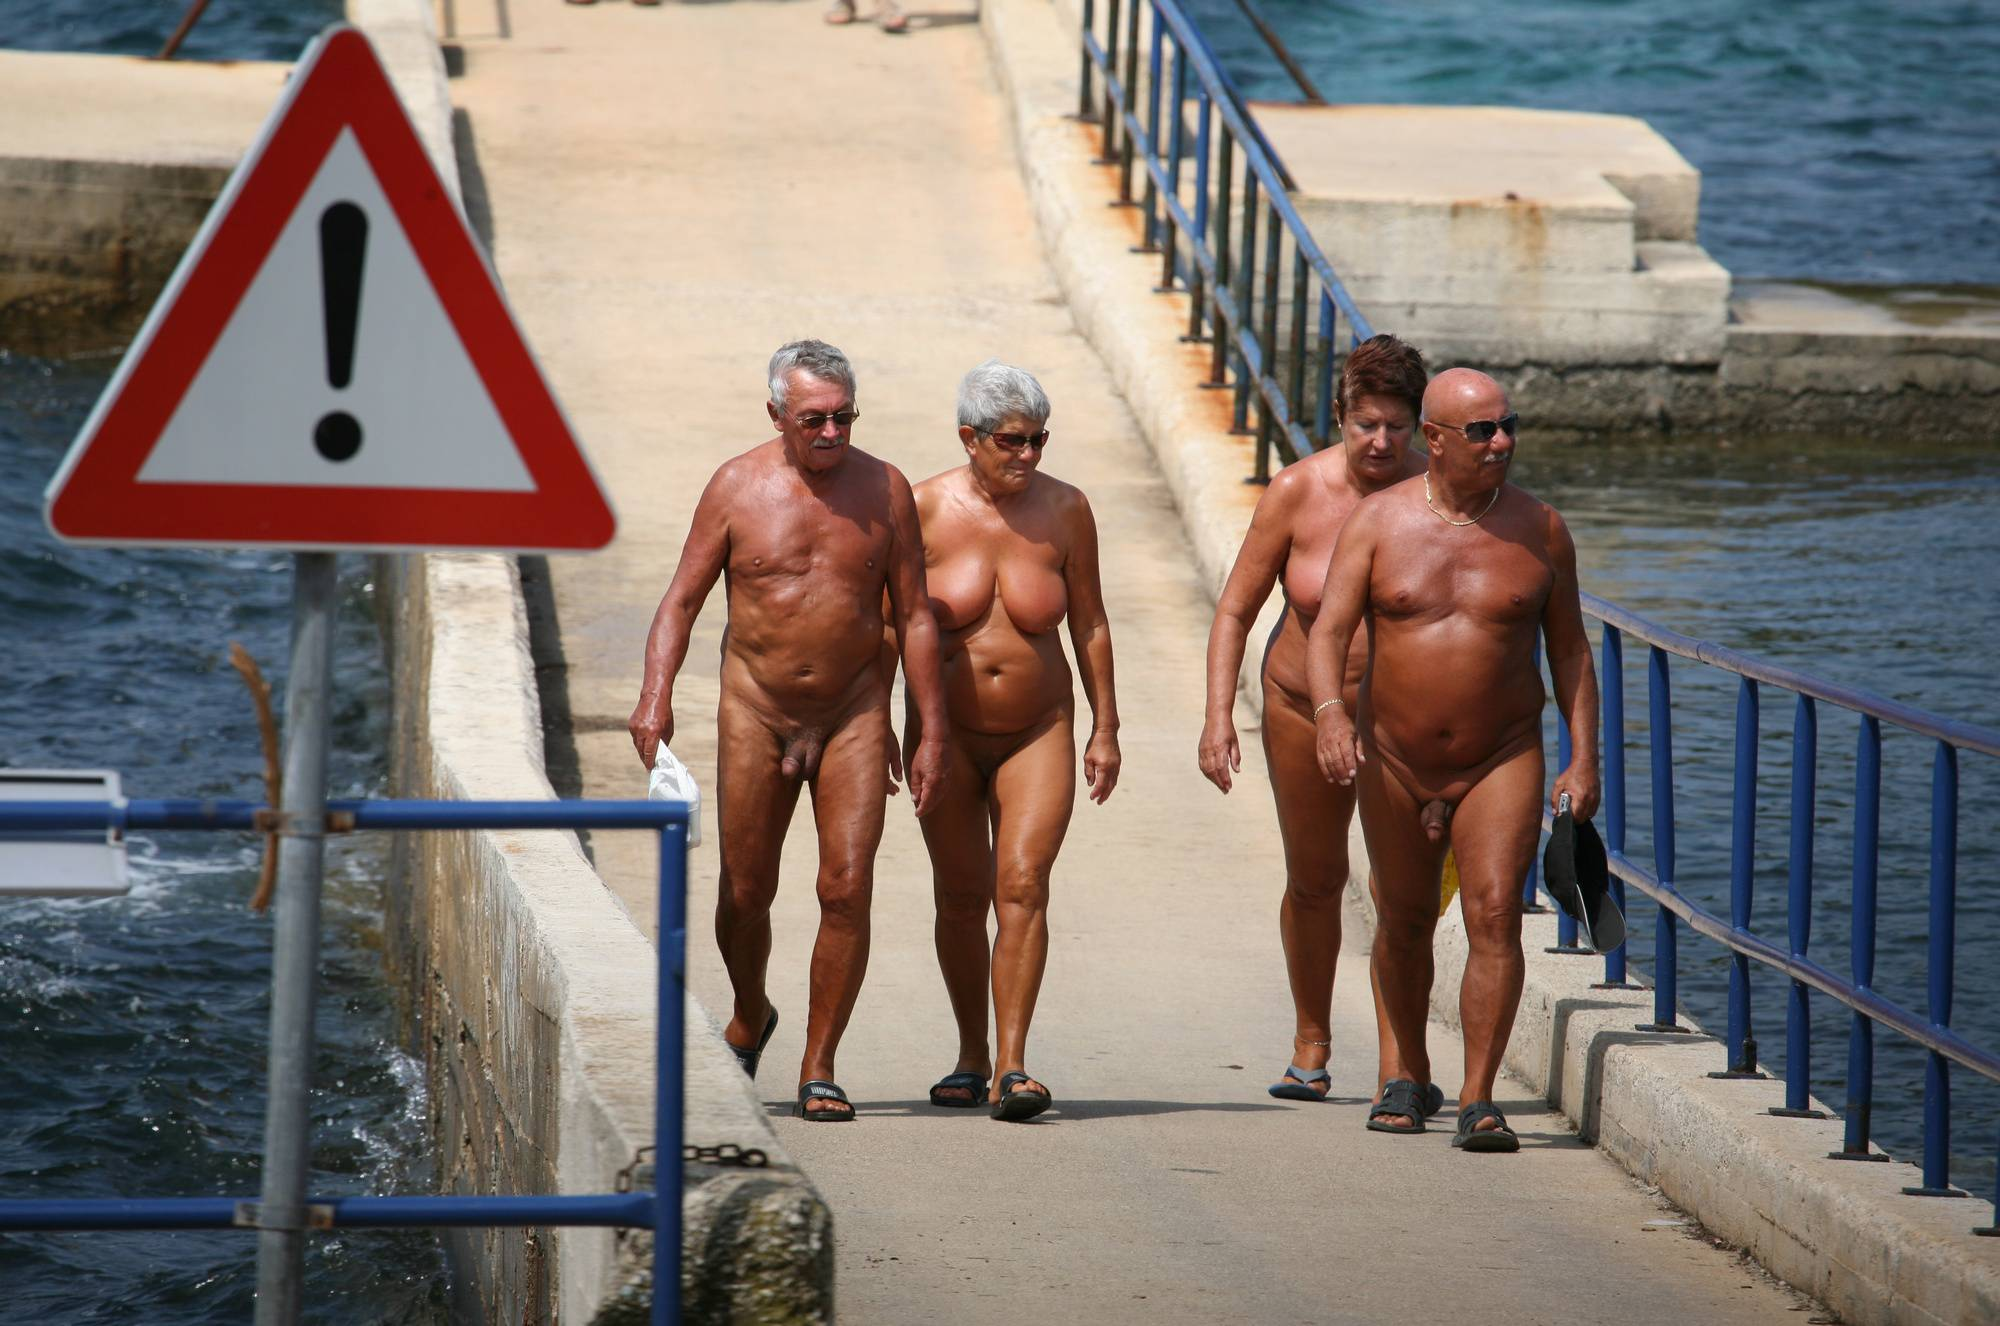 Nudist Pictures Coastal Bridge Crossing - 1